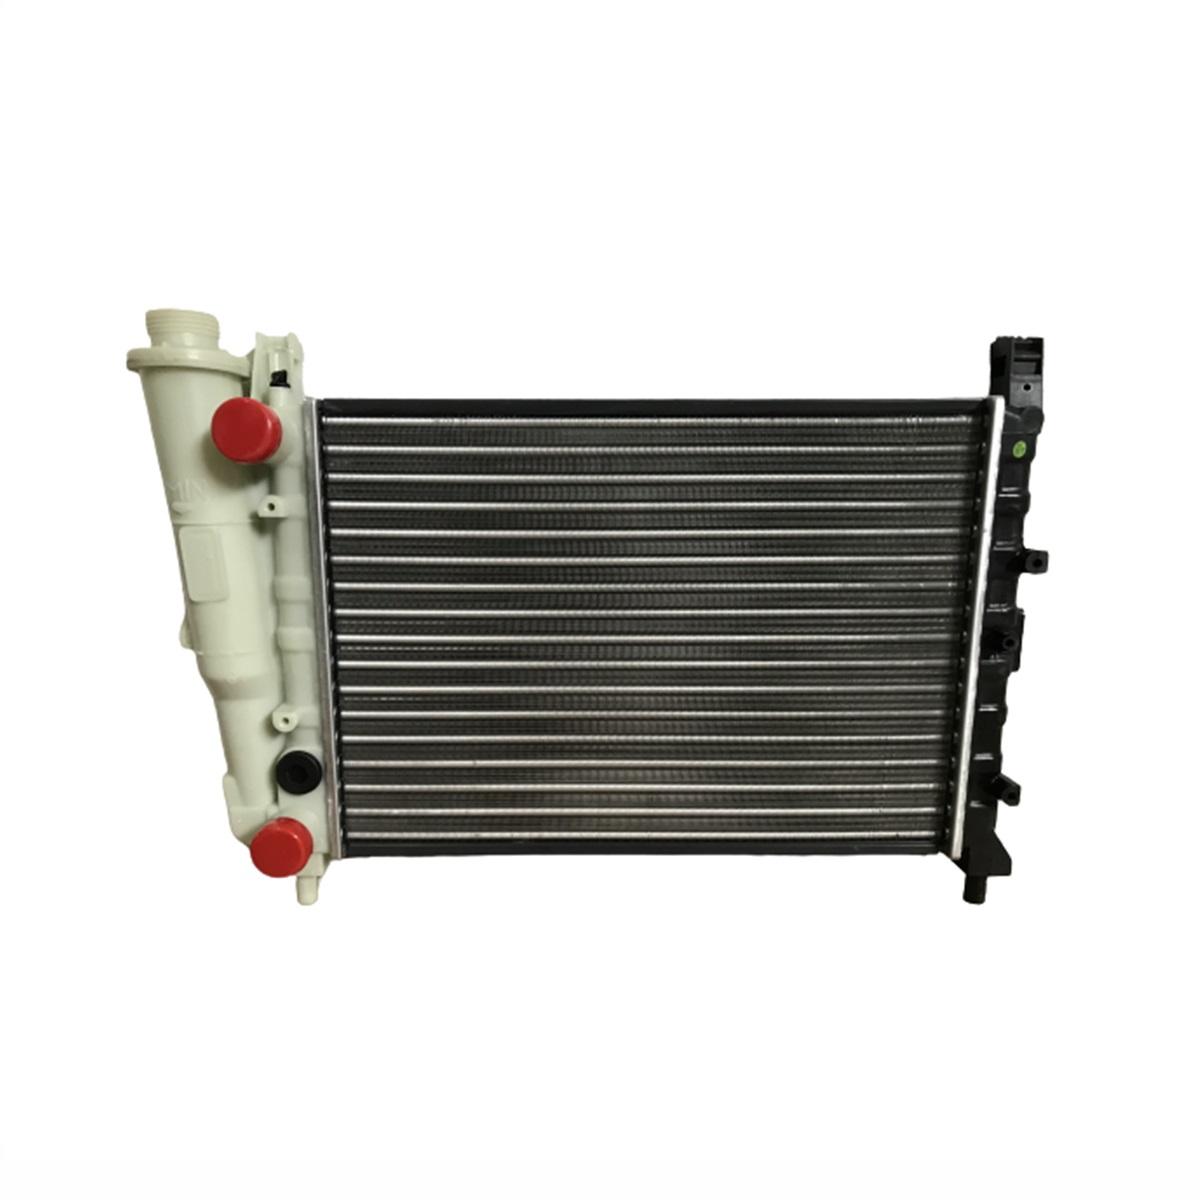 Radiador de Água Uno/Premio/Elba/Fiorino 1.0 94> 1.5 85-87 1.0/1.3 8V FIRE S/AR C/TM C/RESERVATORIO